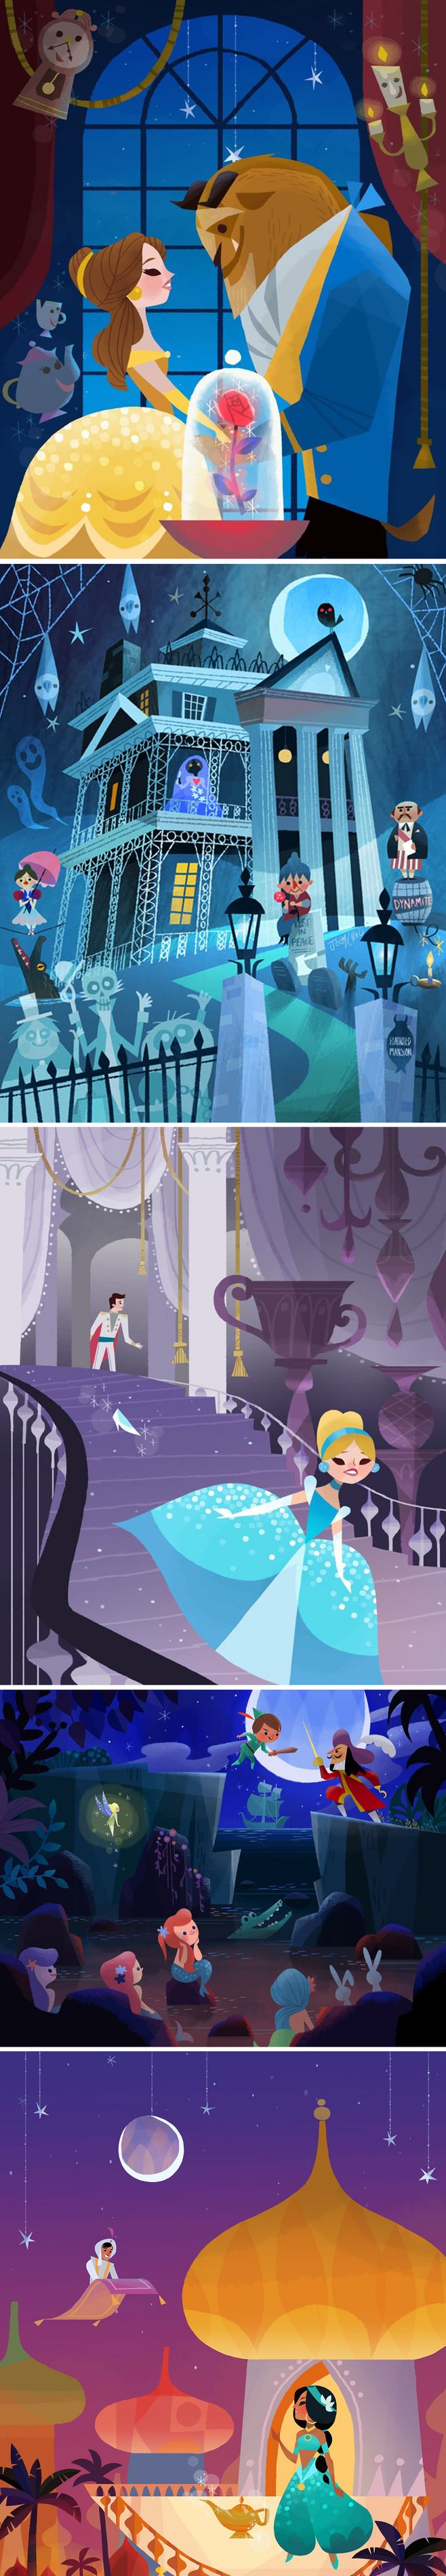 Its Disney, a bit old school, Mary Blair Style